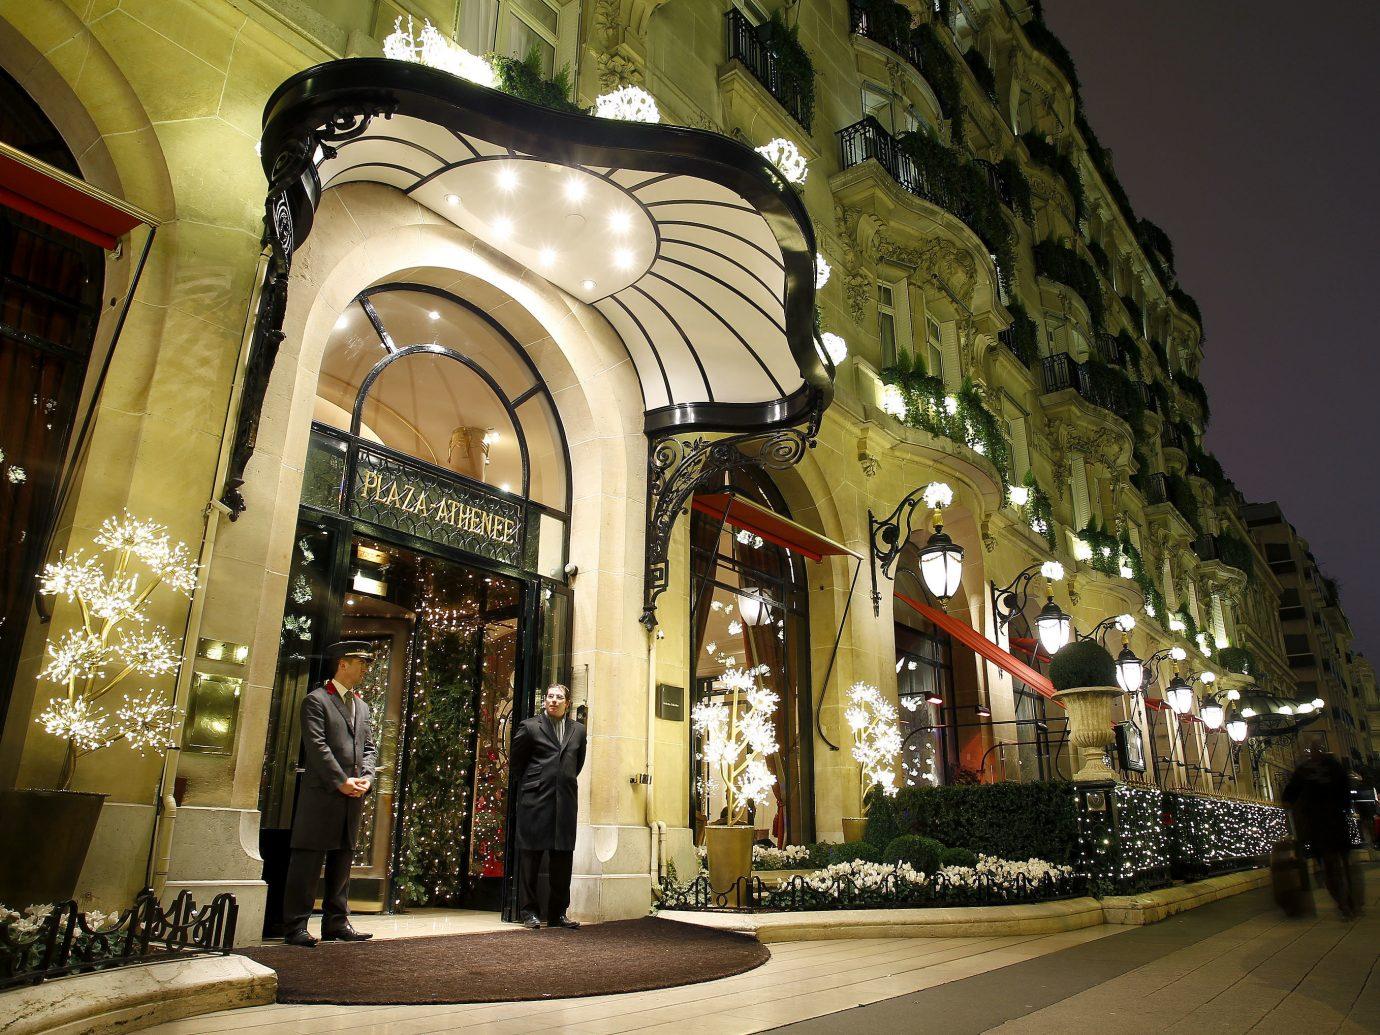 Hotels Luxury Travel road Town urban area night Architecture street lighting arcade arch